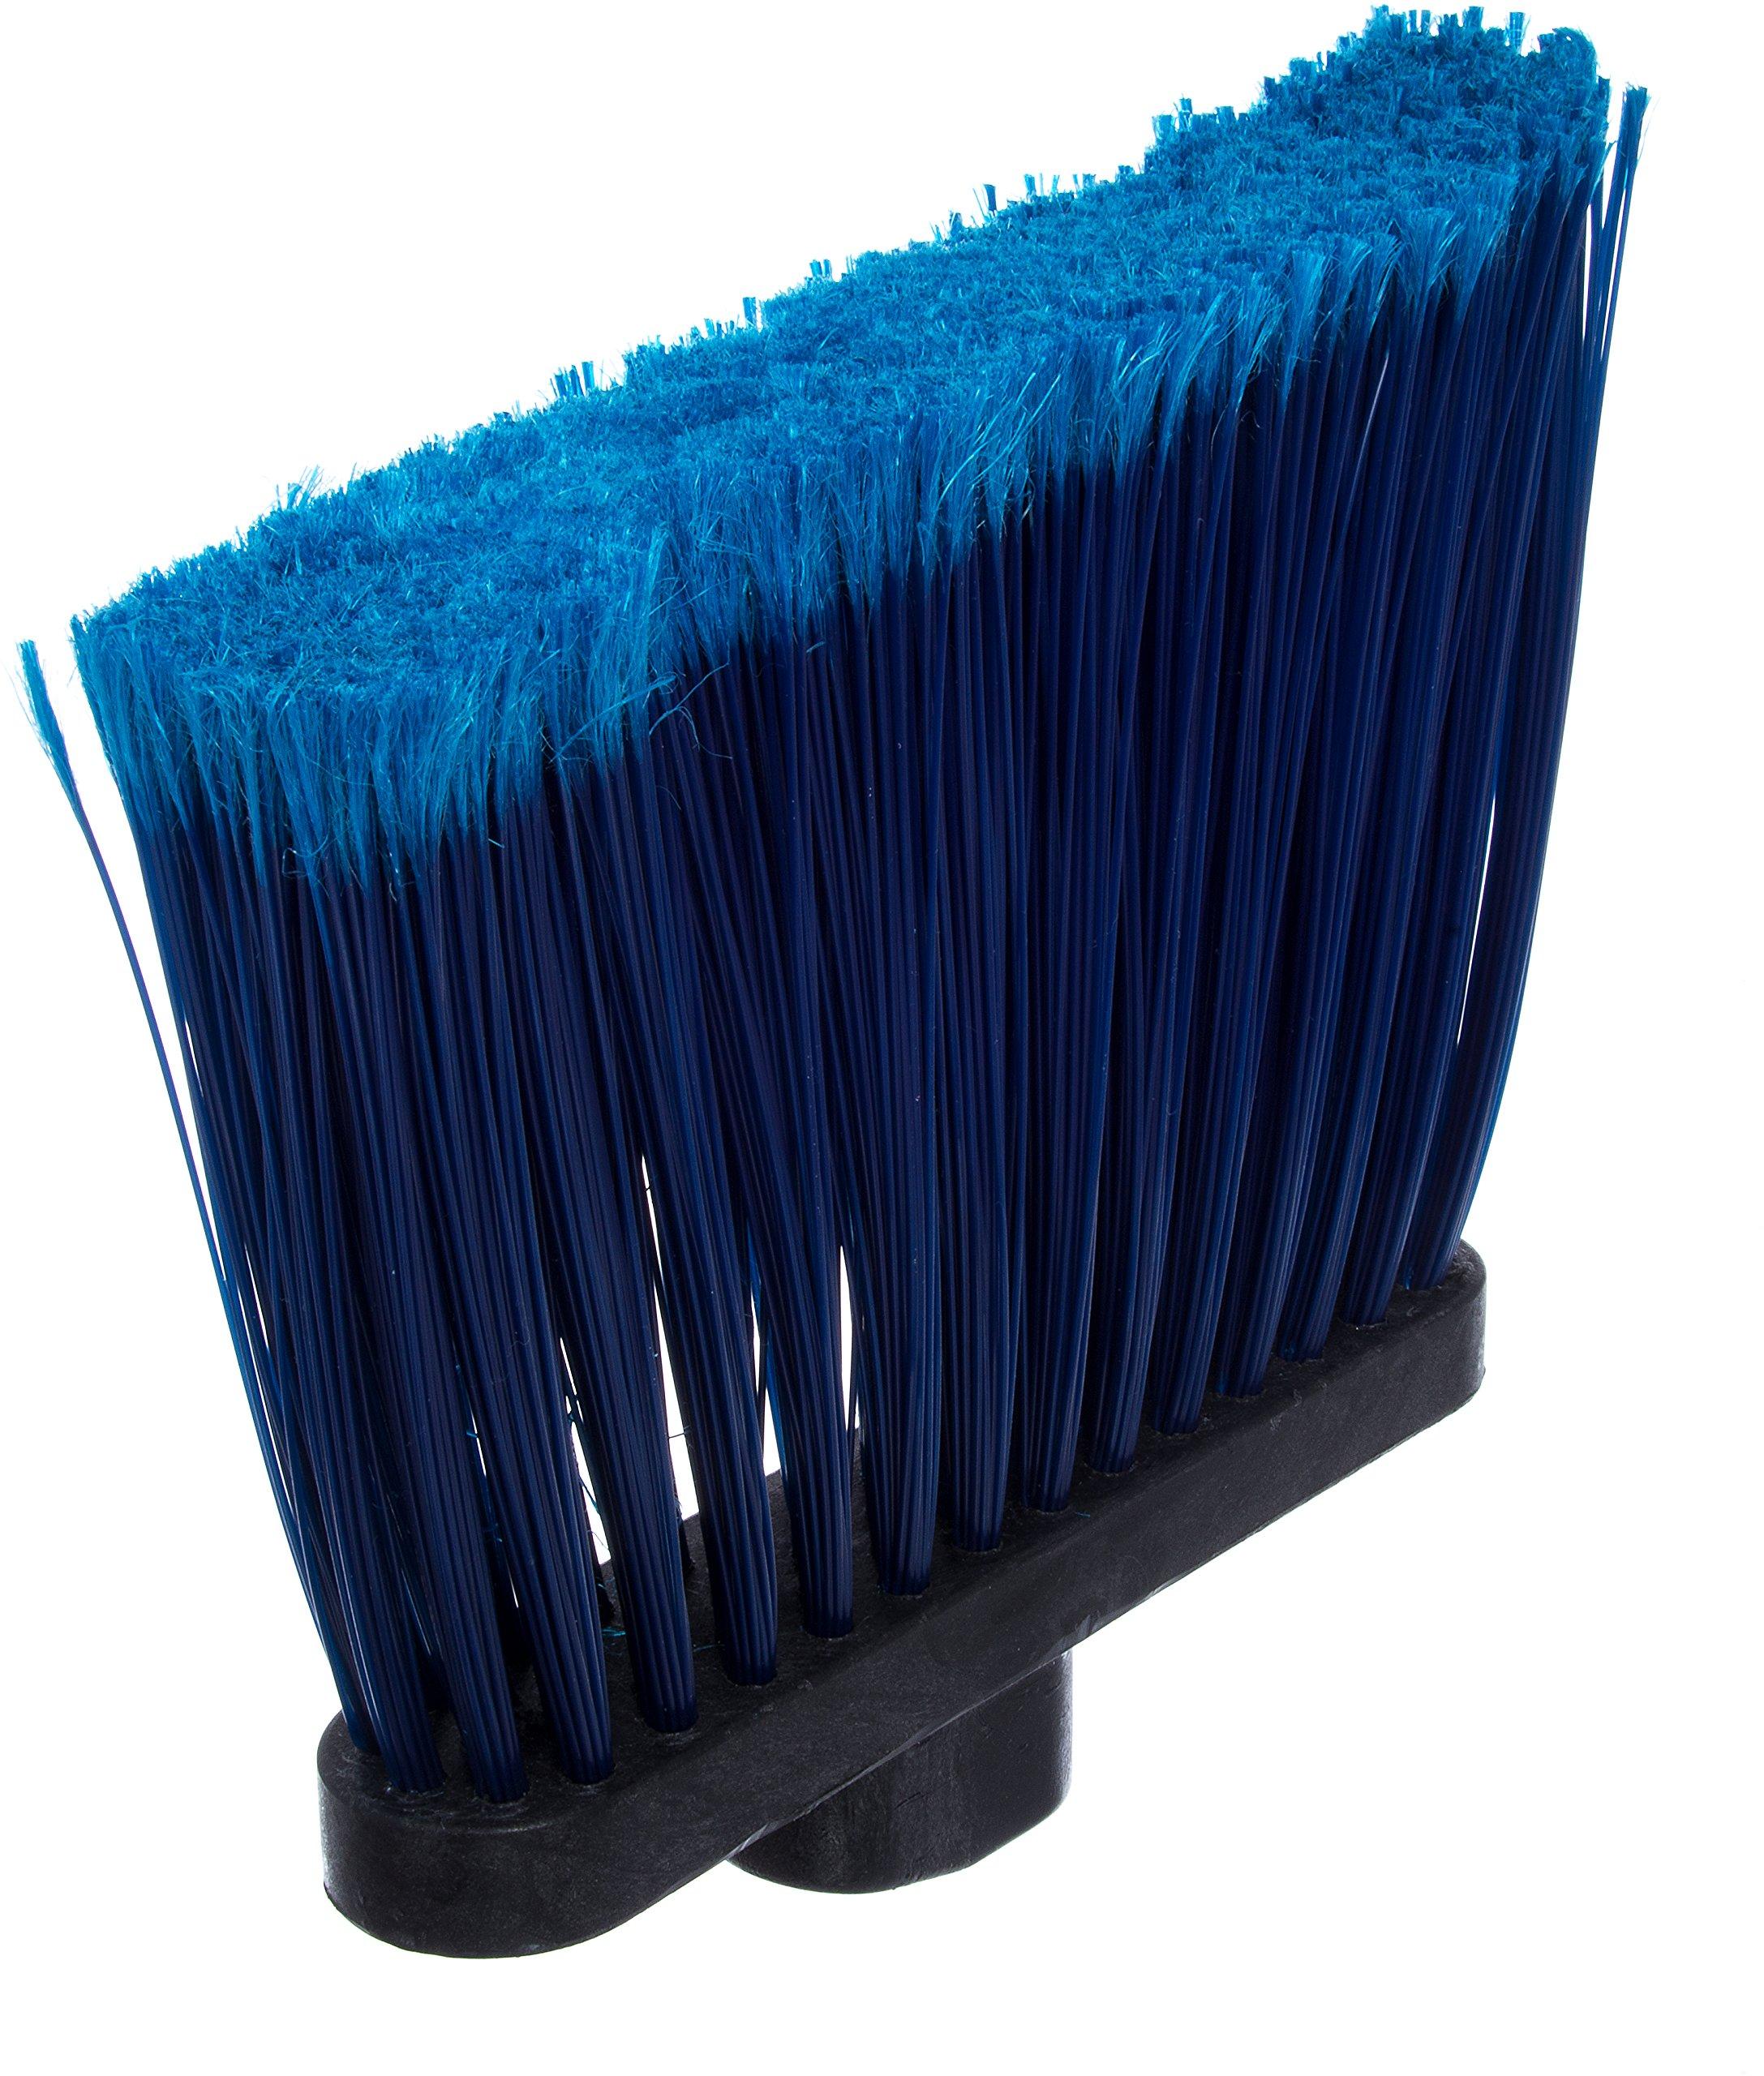 Carlisle 3686714 Duo-Sweep Medium Duty Flagged Angle Broom Head, Polypropylene Bristle, 8'' Overall Length x 12'' Width, Blue (Pack of 12) by Carlisle (Image #4)